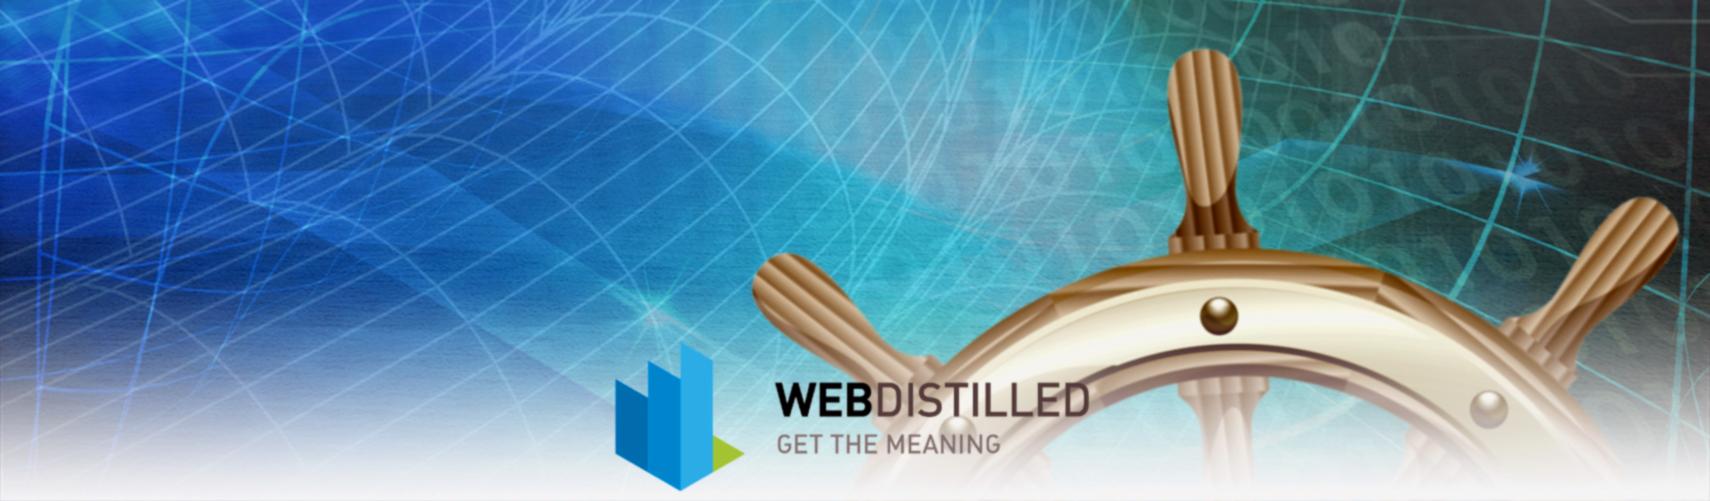 Webdistilled